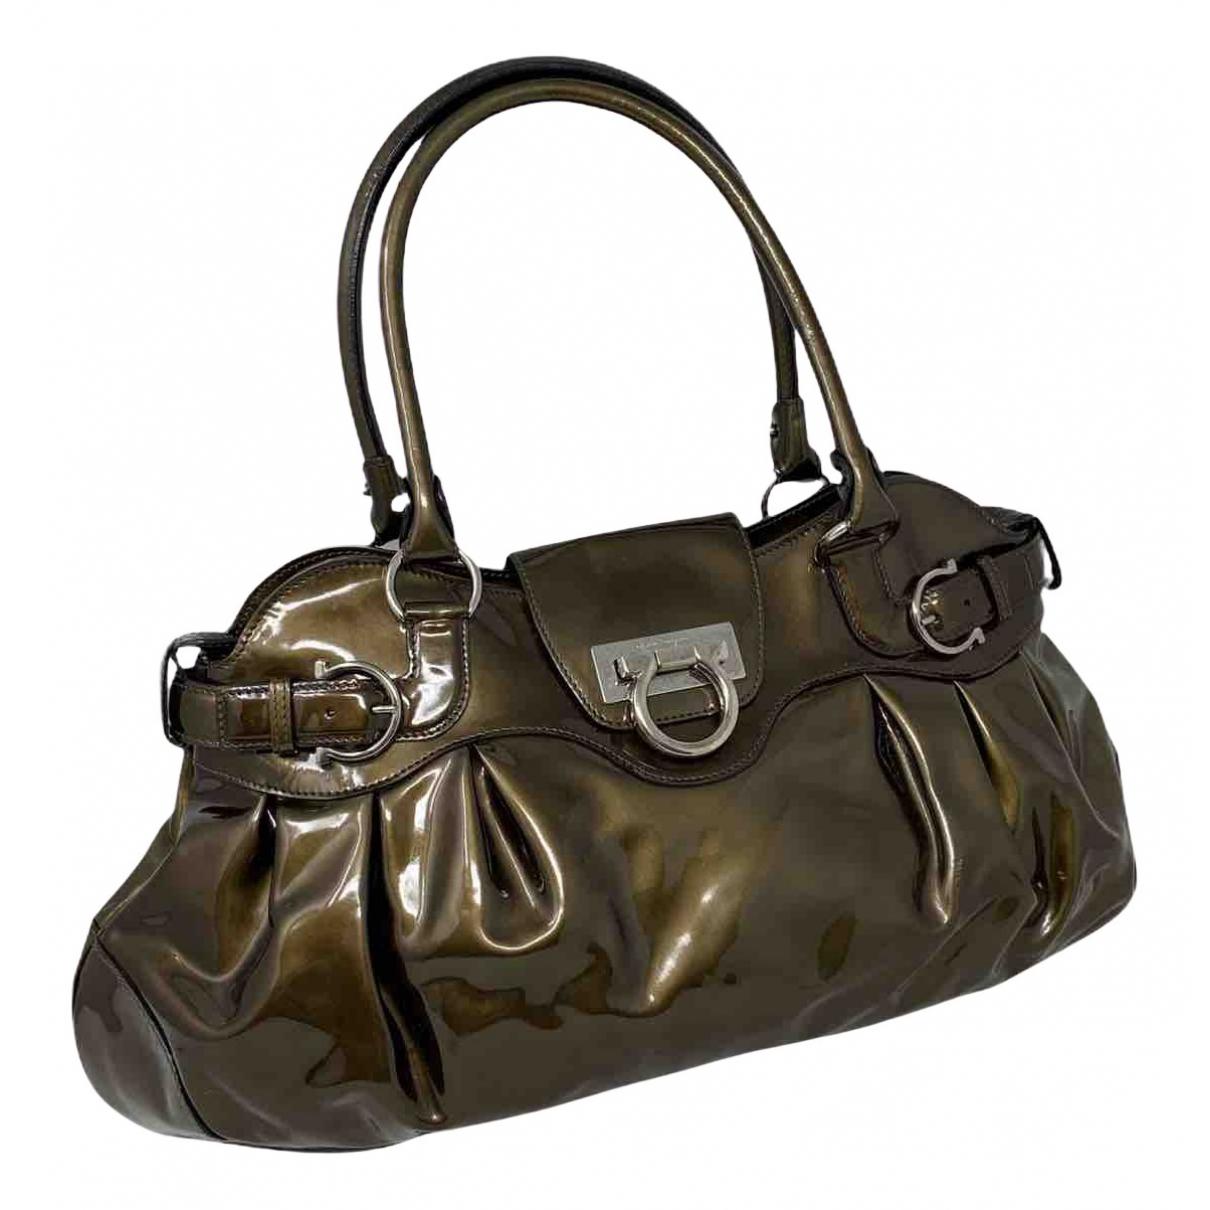 Salvatore Ferragamo \N Handtasche in  Gruen Lackleder